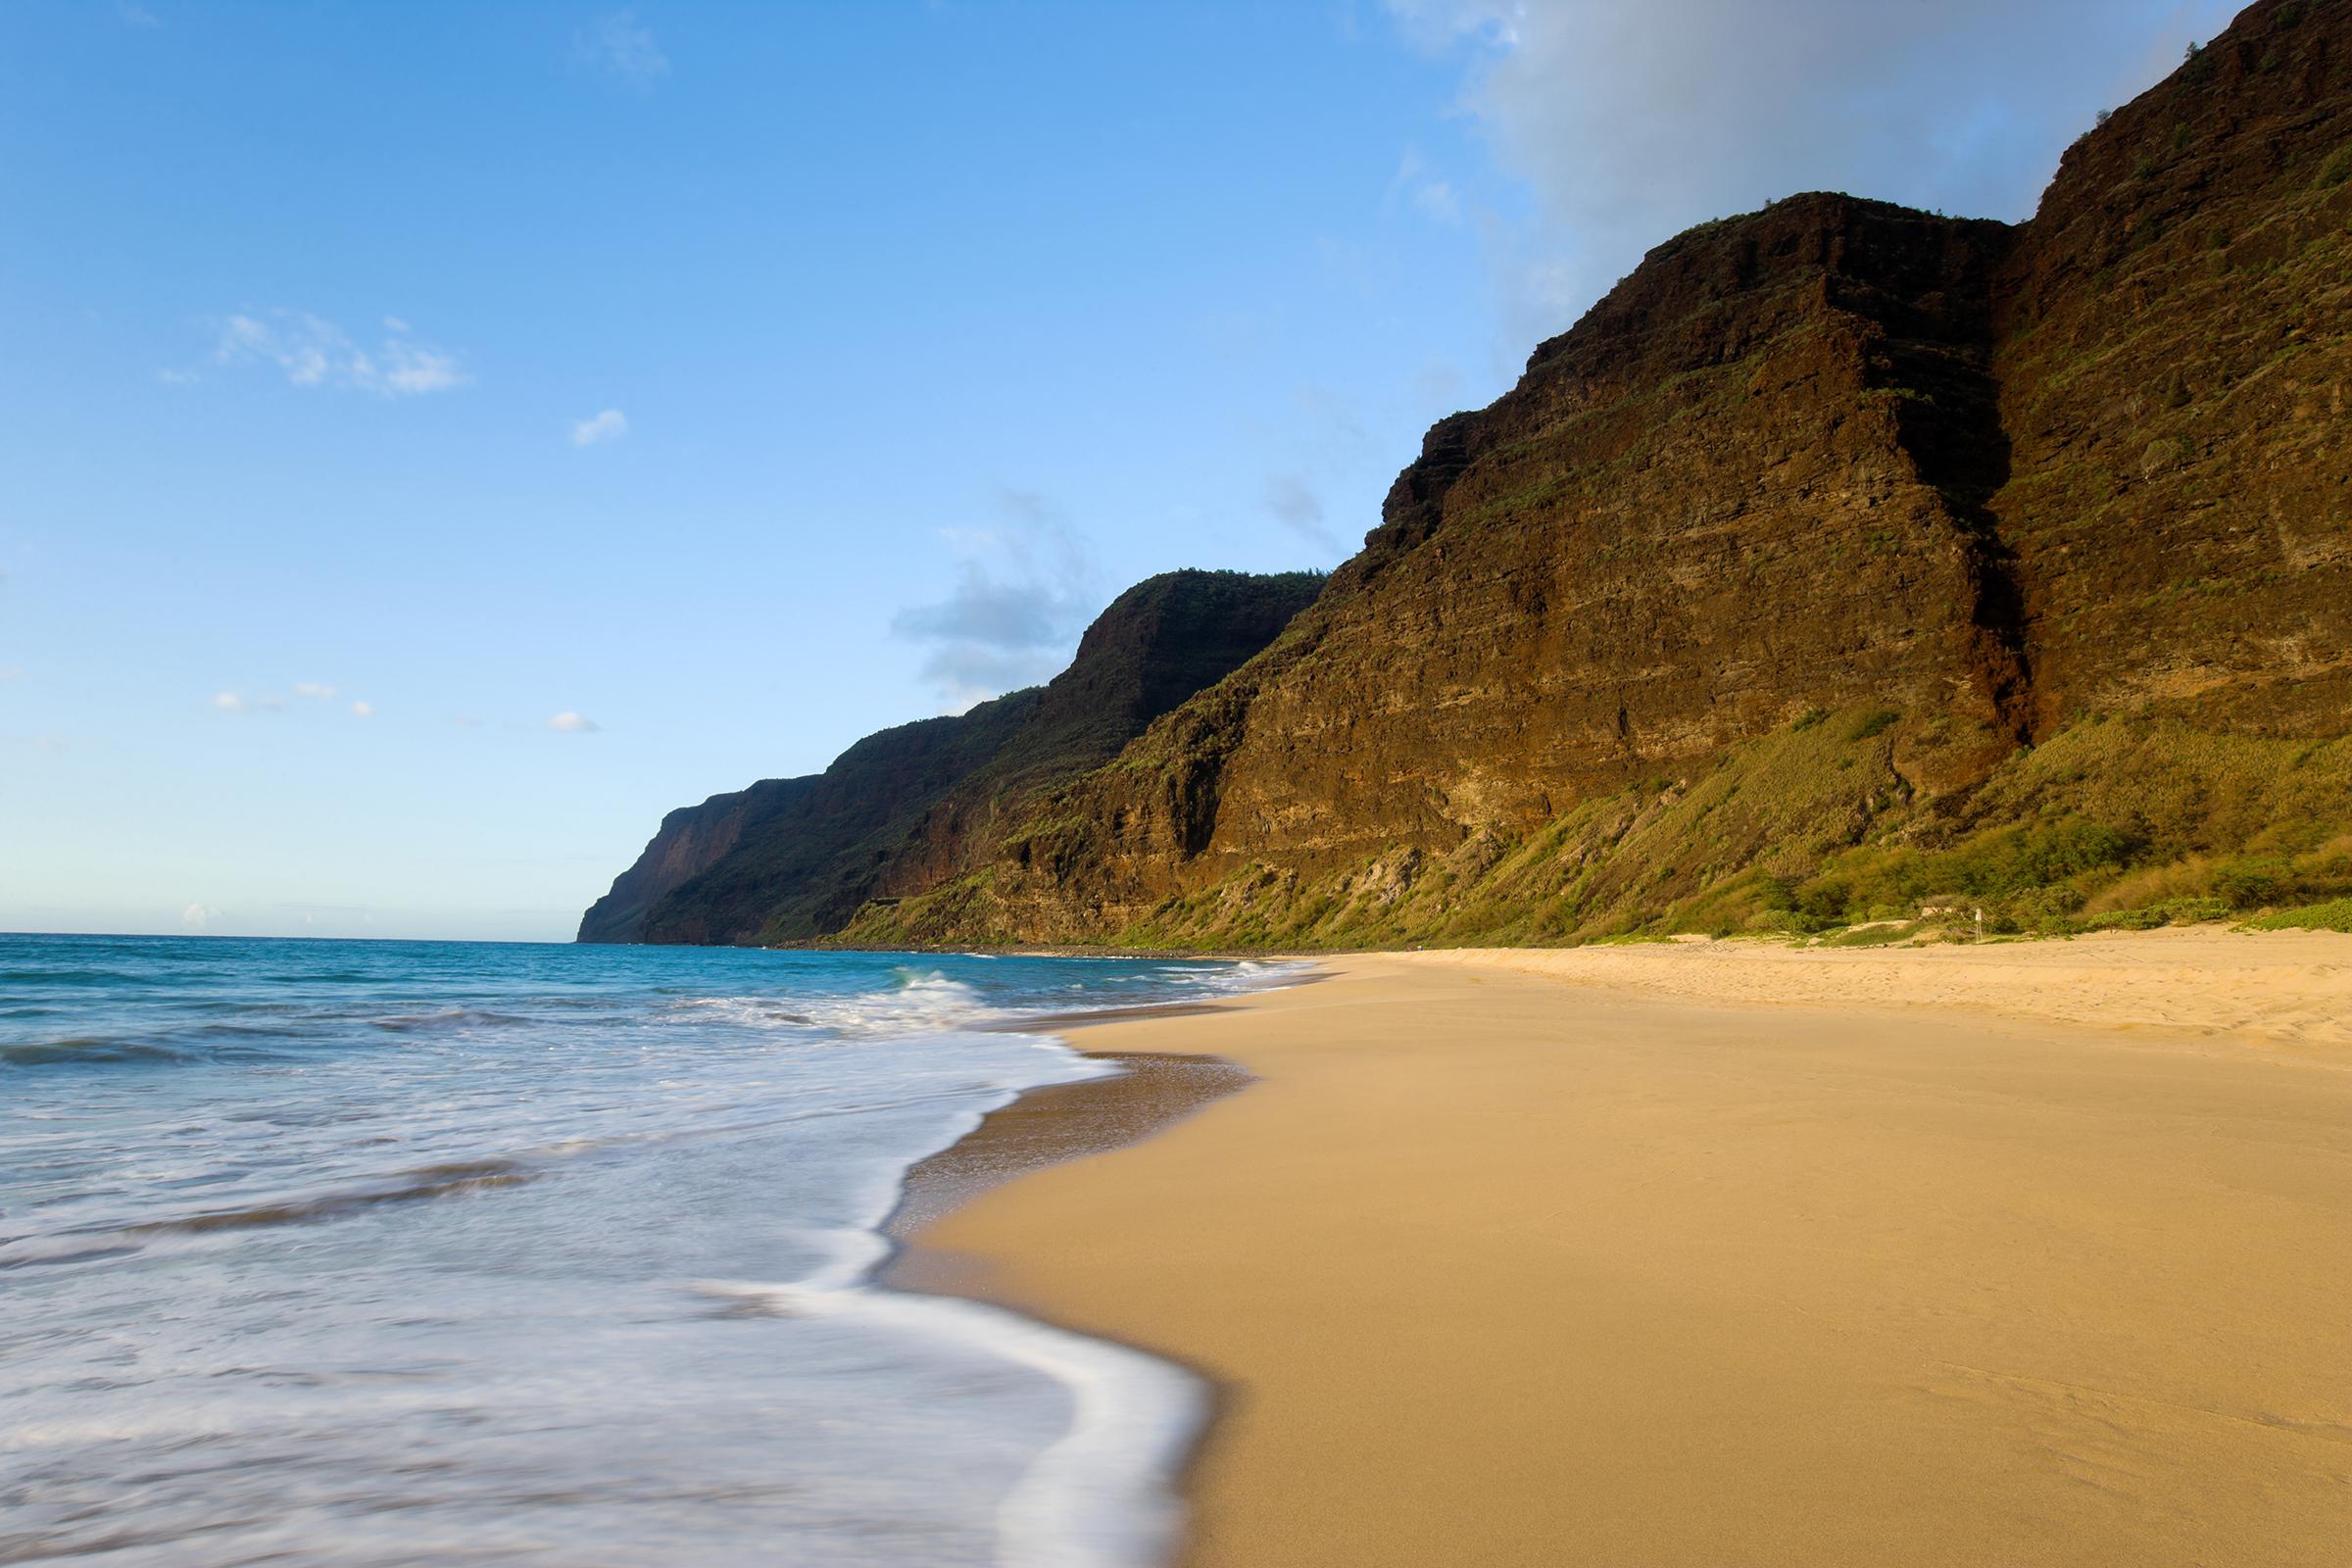 Lo mejor para paz y tranquilidad Polihale Beach Kauai Hawi